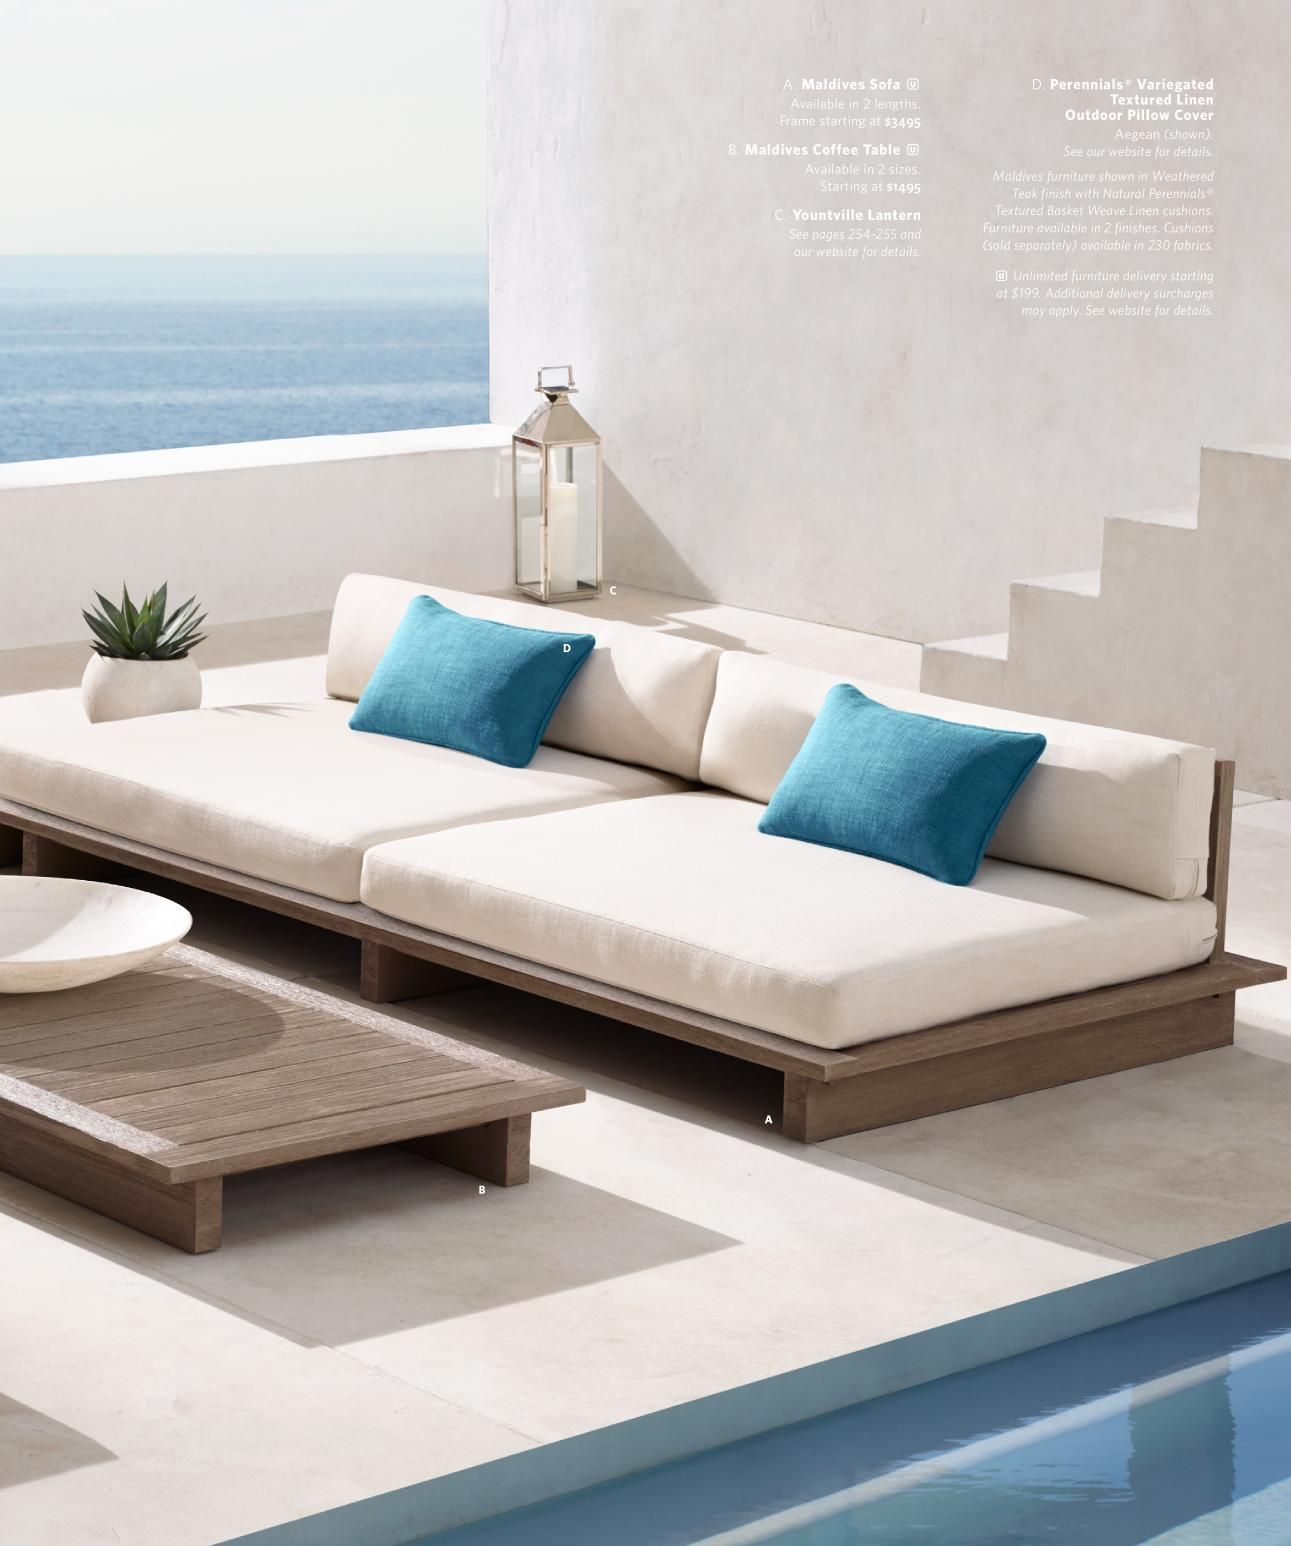 Rh Source Books Restoration Hardware Outdoor Sofa Furniture